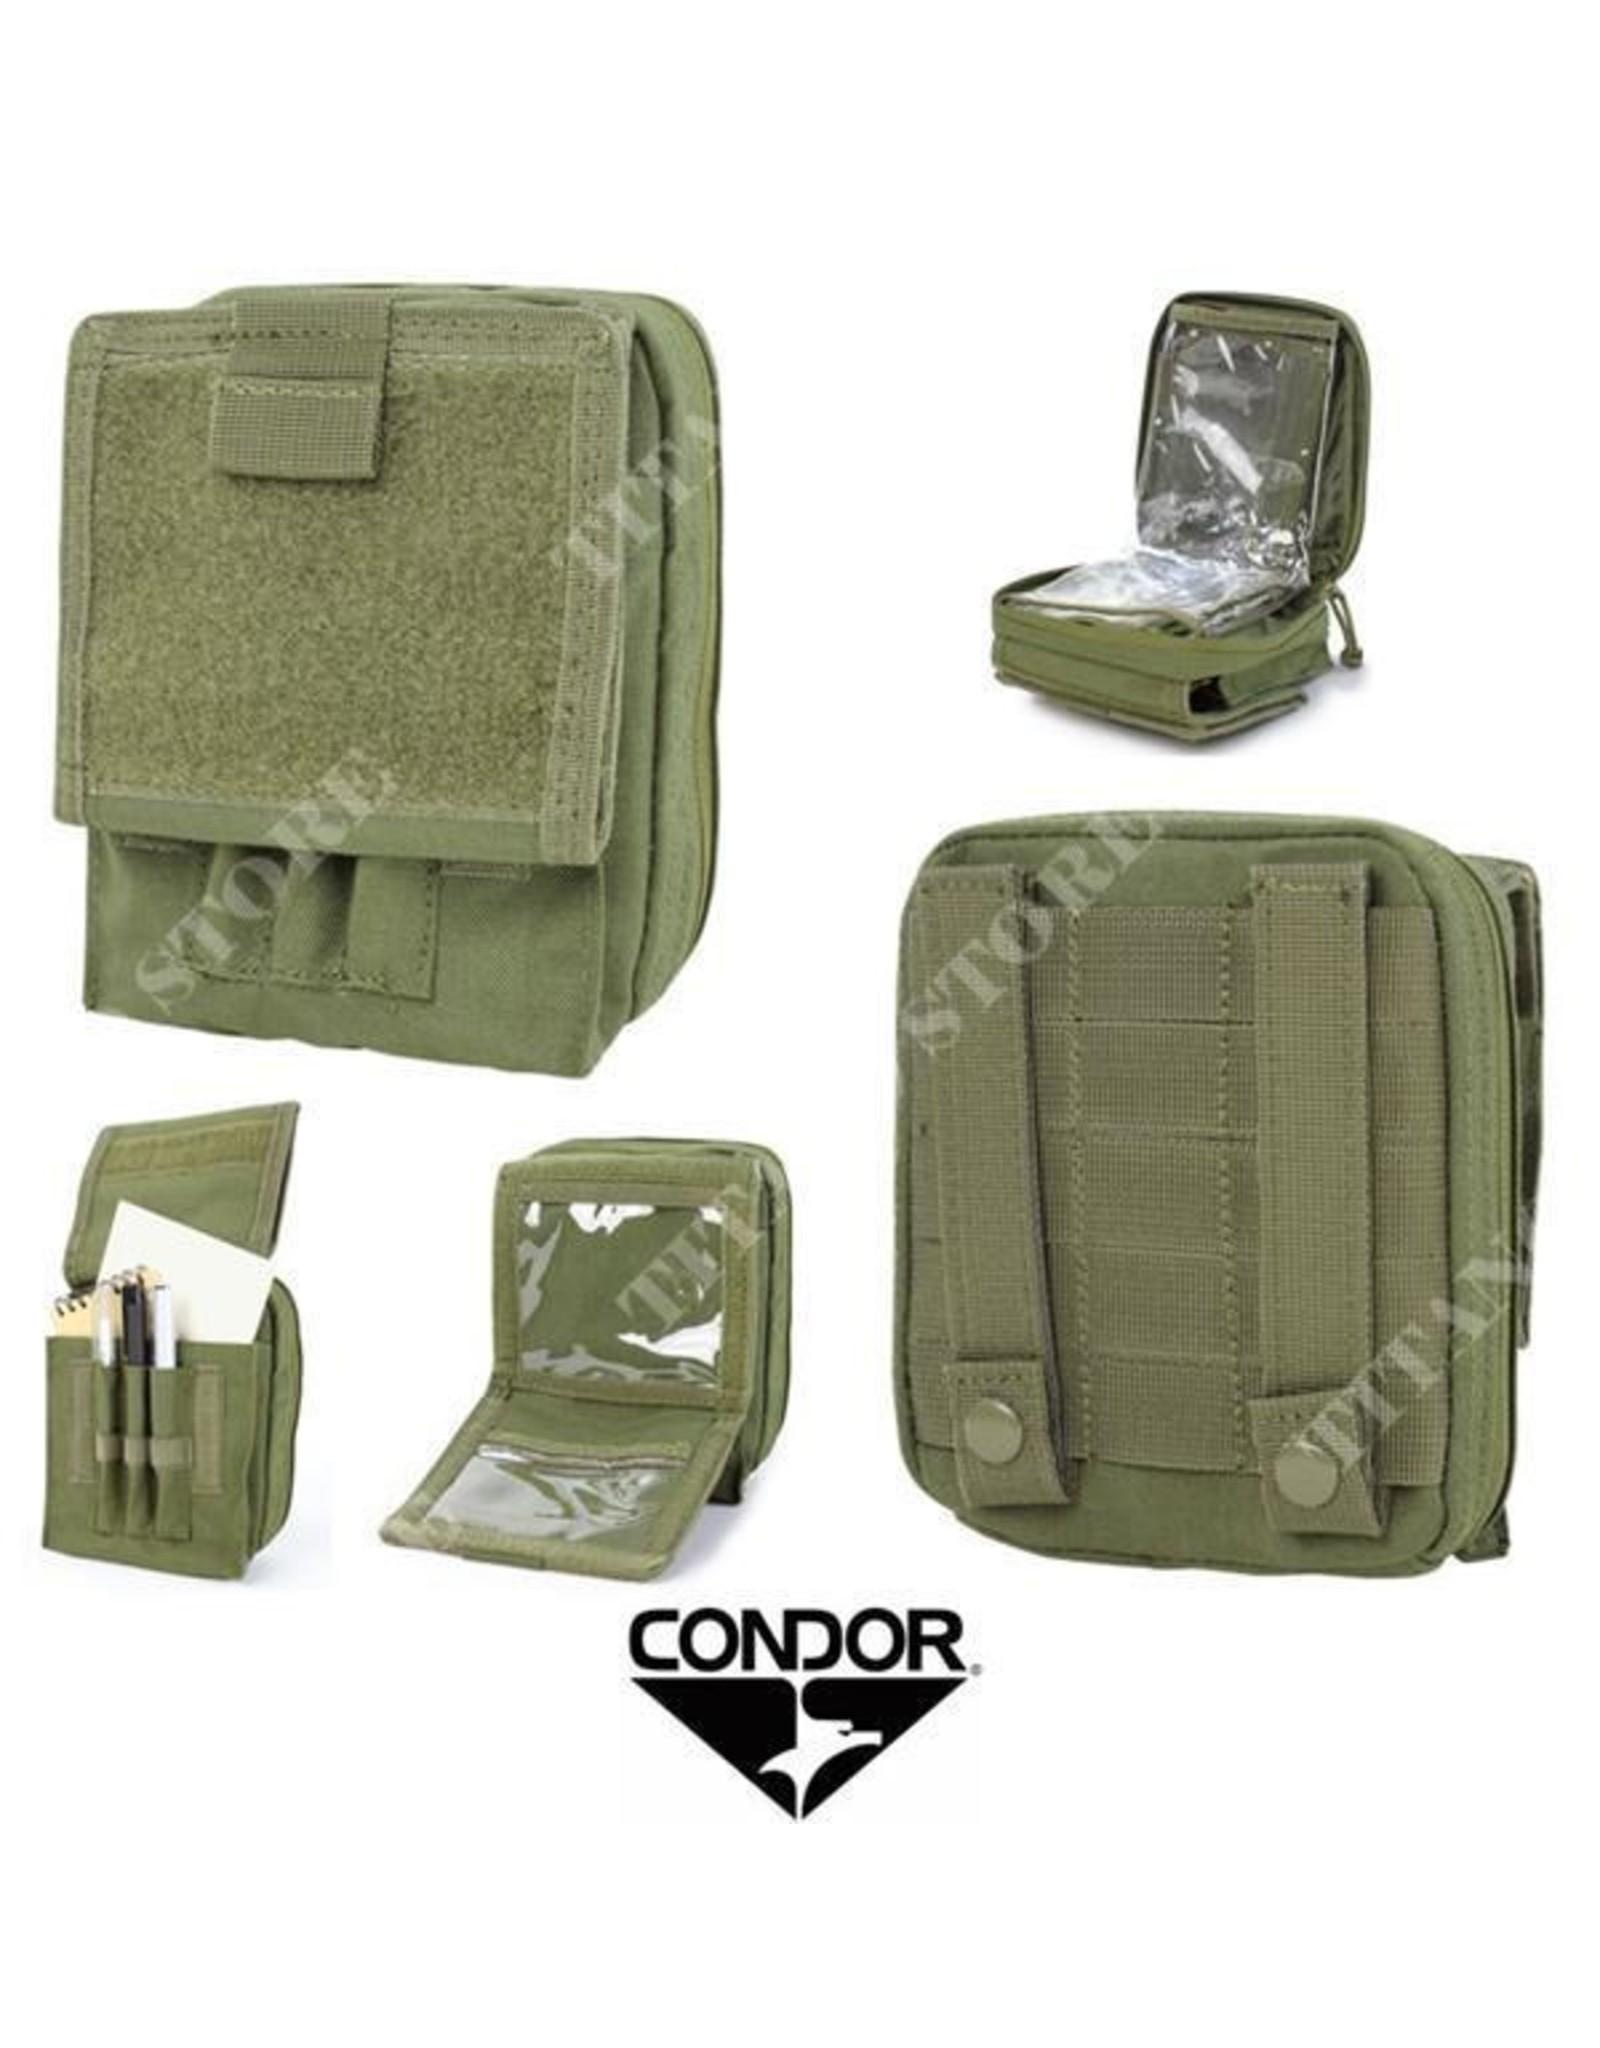 CONDOR TACTICAL MA35 CONDOR- MAP POUCH, OD